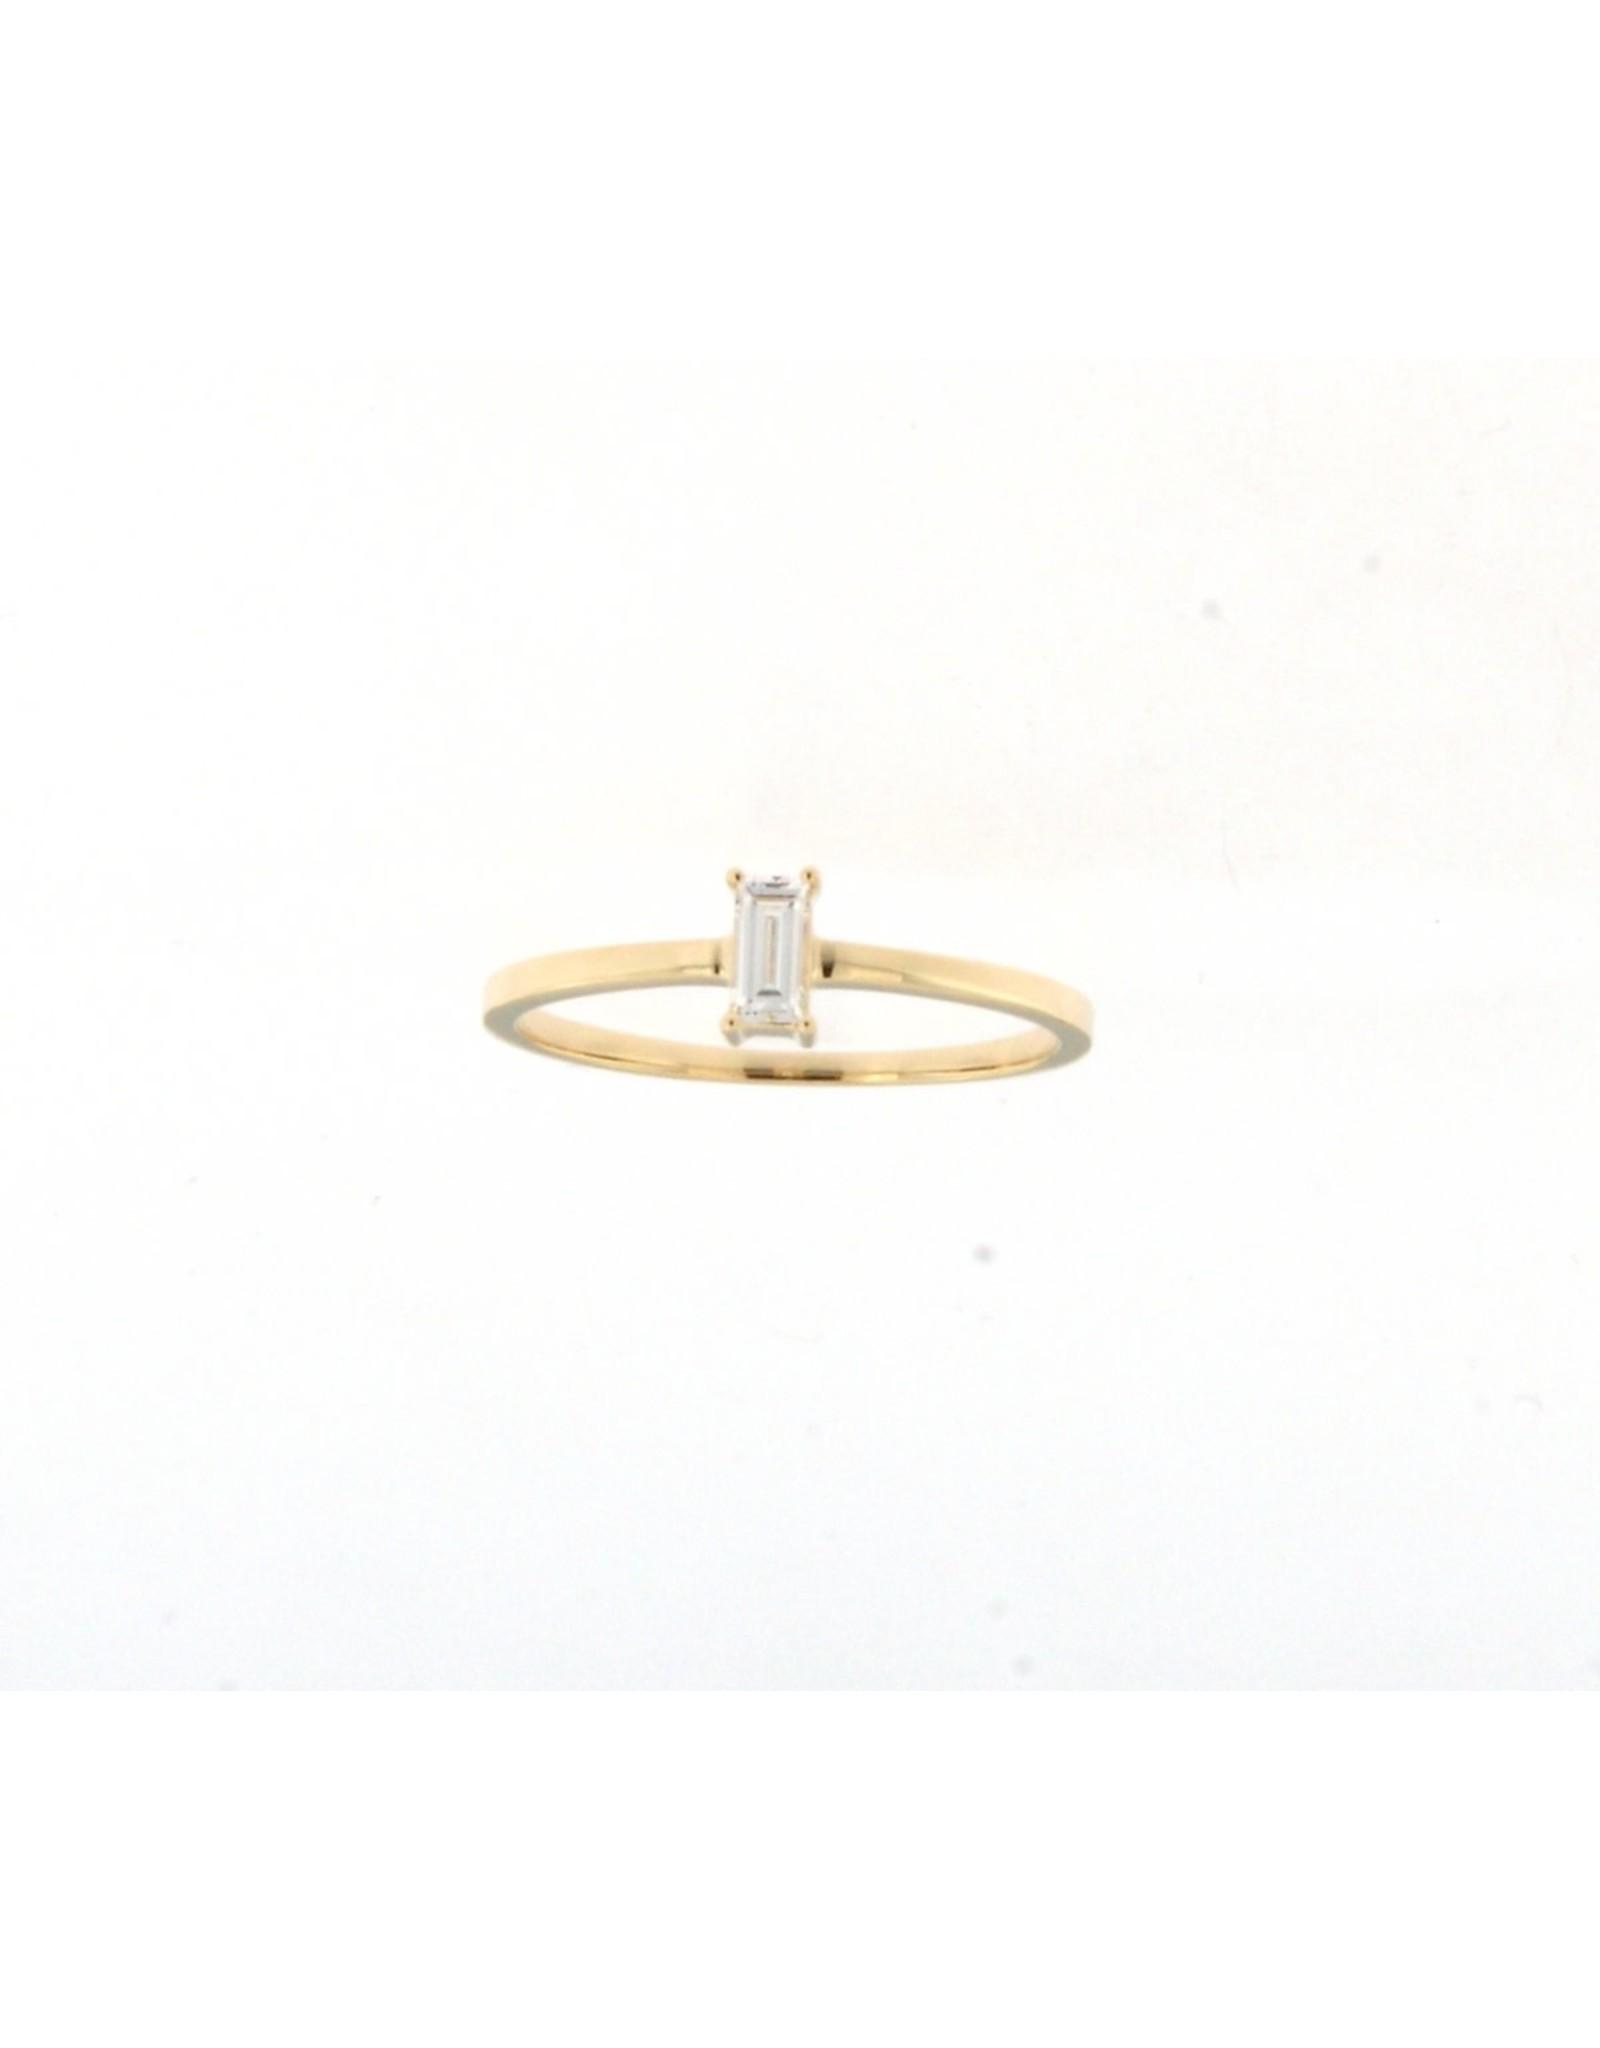 Ring Solitaire Geel Goud 18kt baguette diamant 063815/A/14